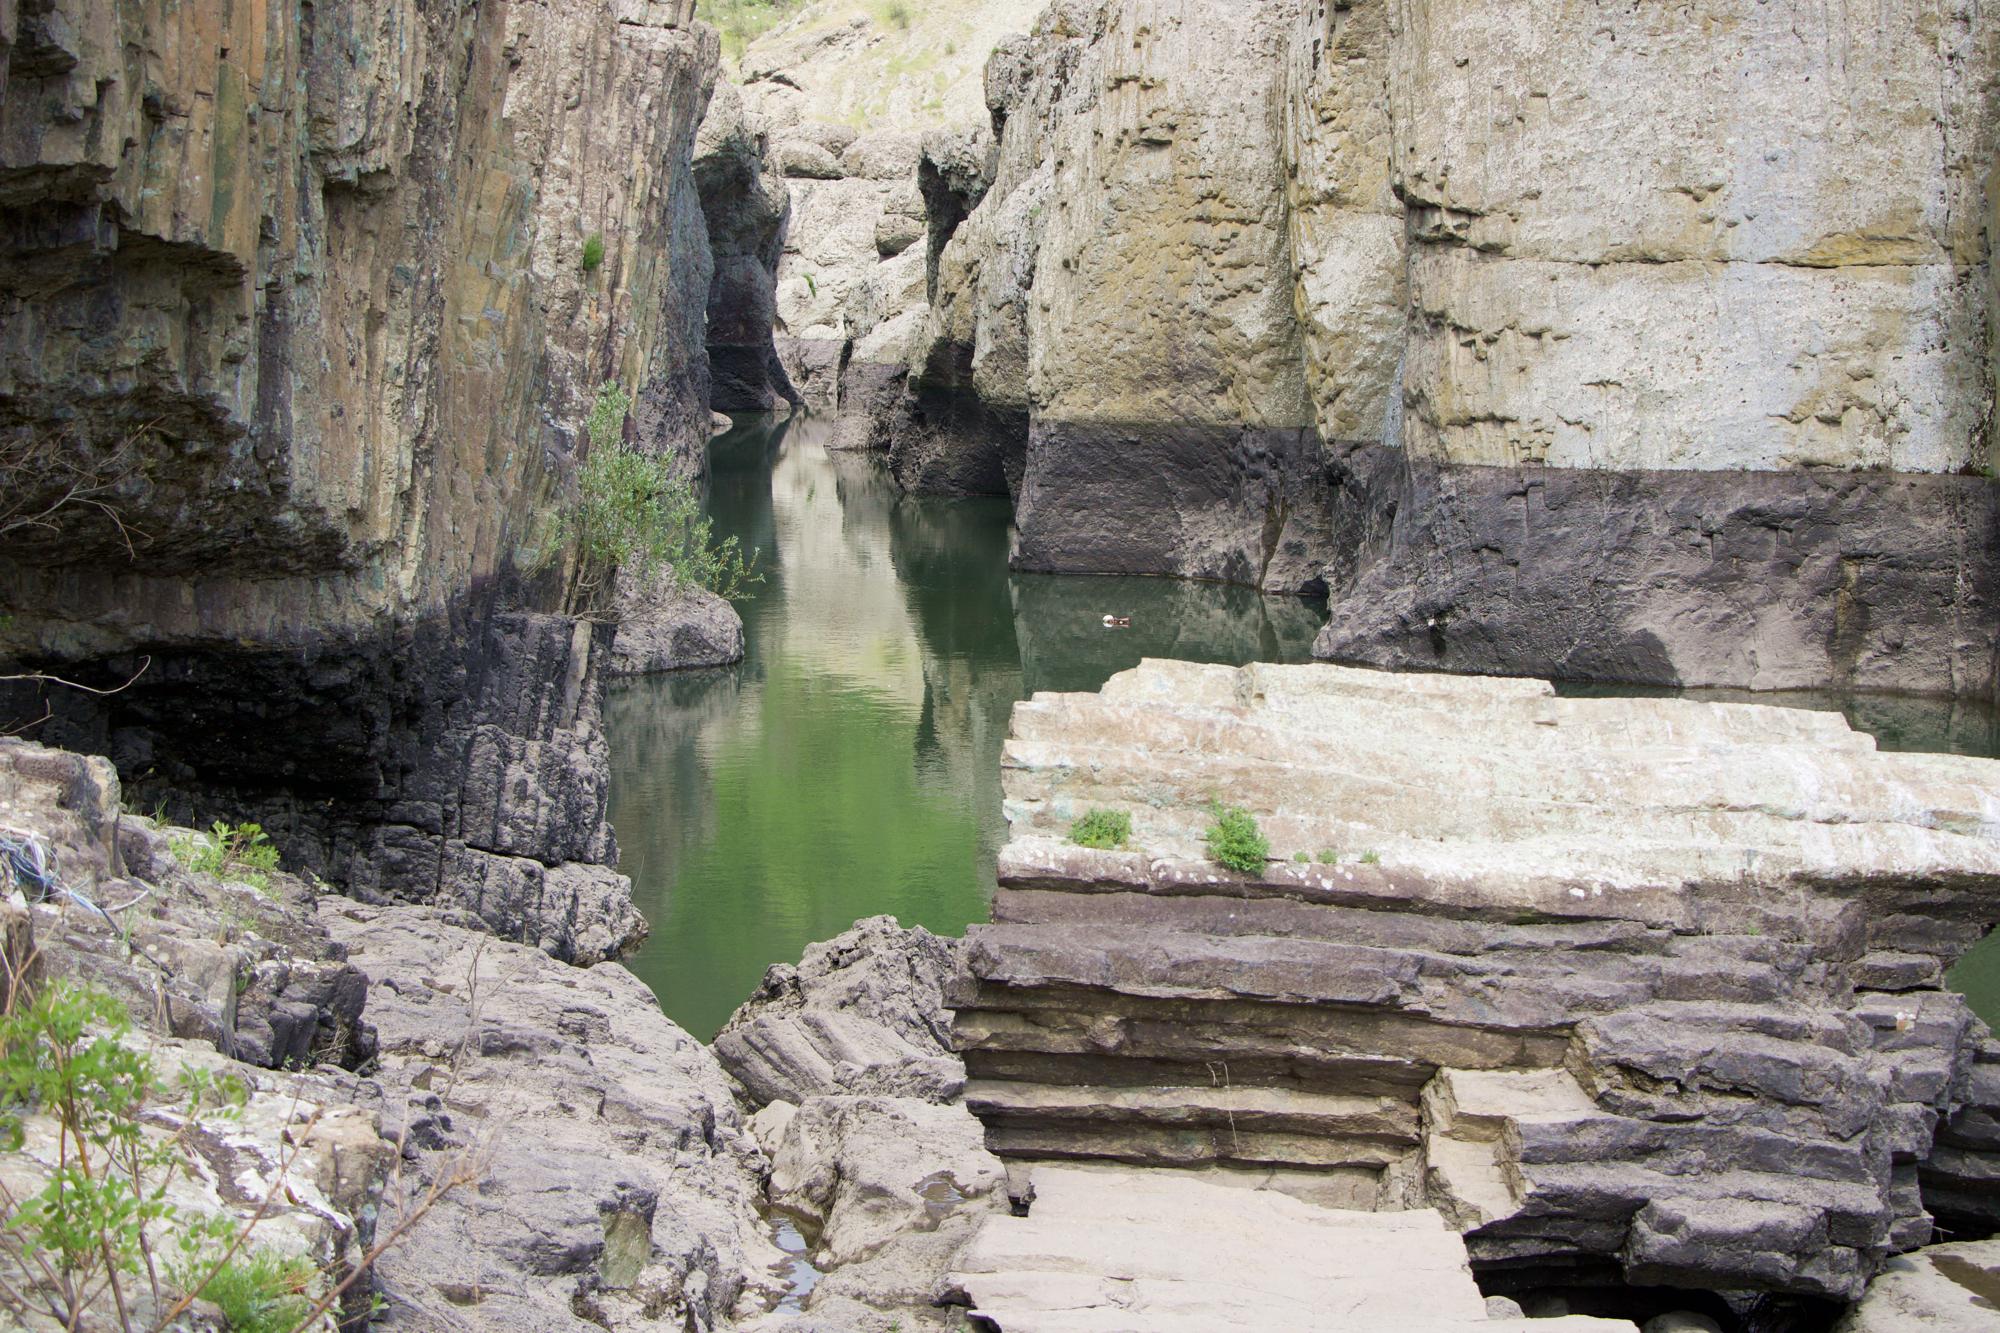 Шейтан дере или Дяволският каньон по поречението на река Арда